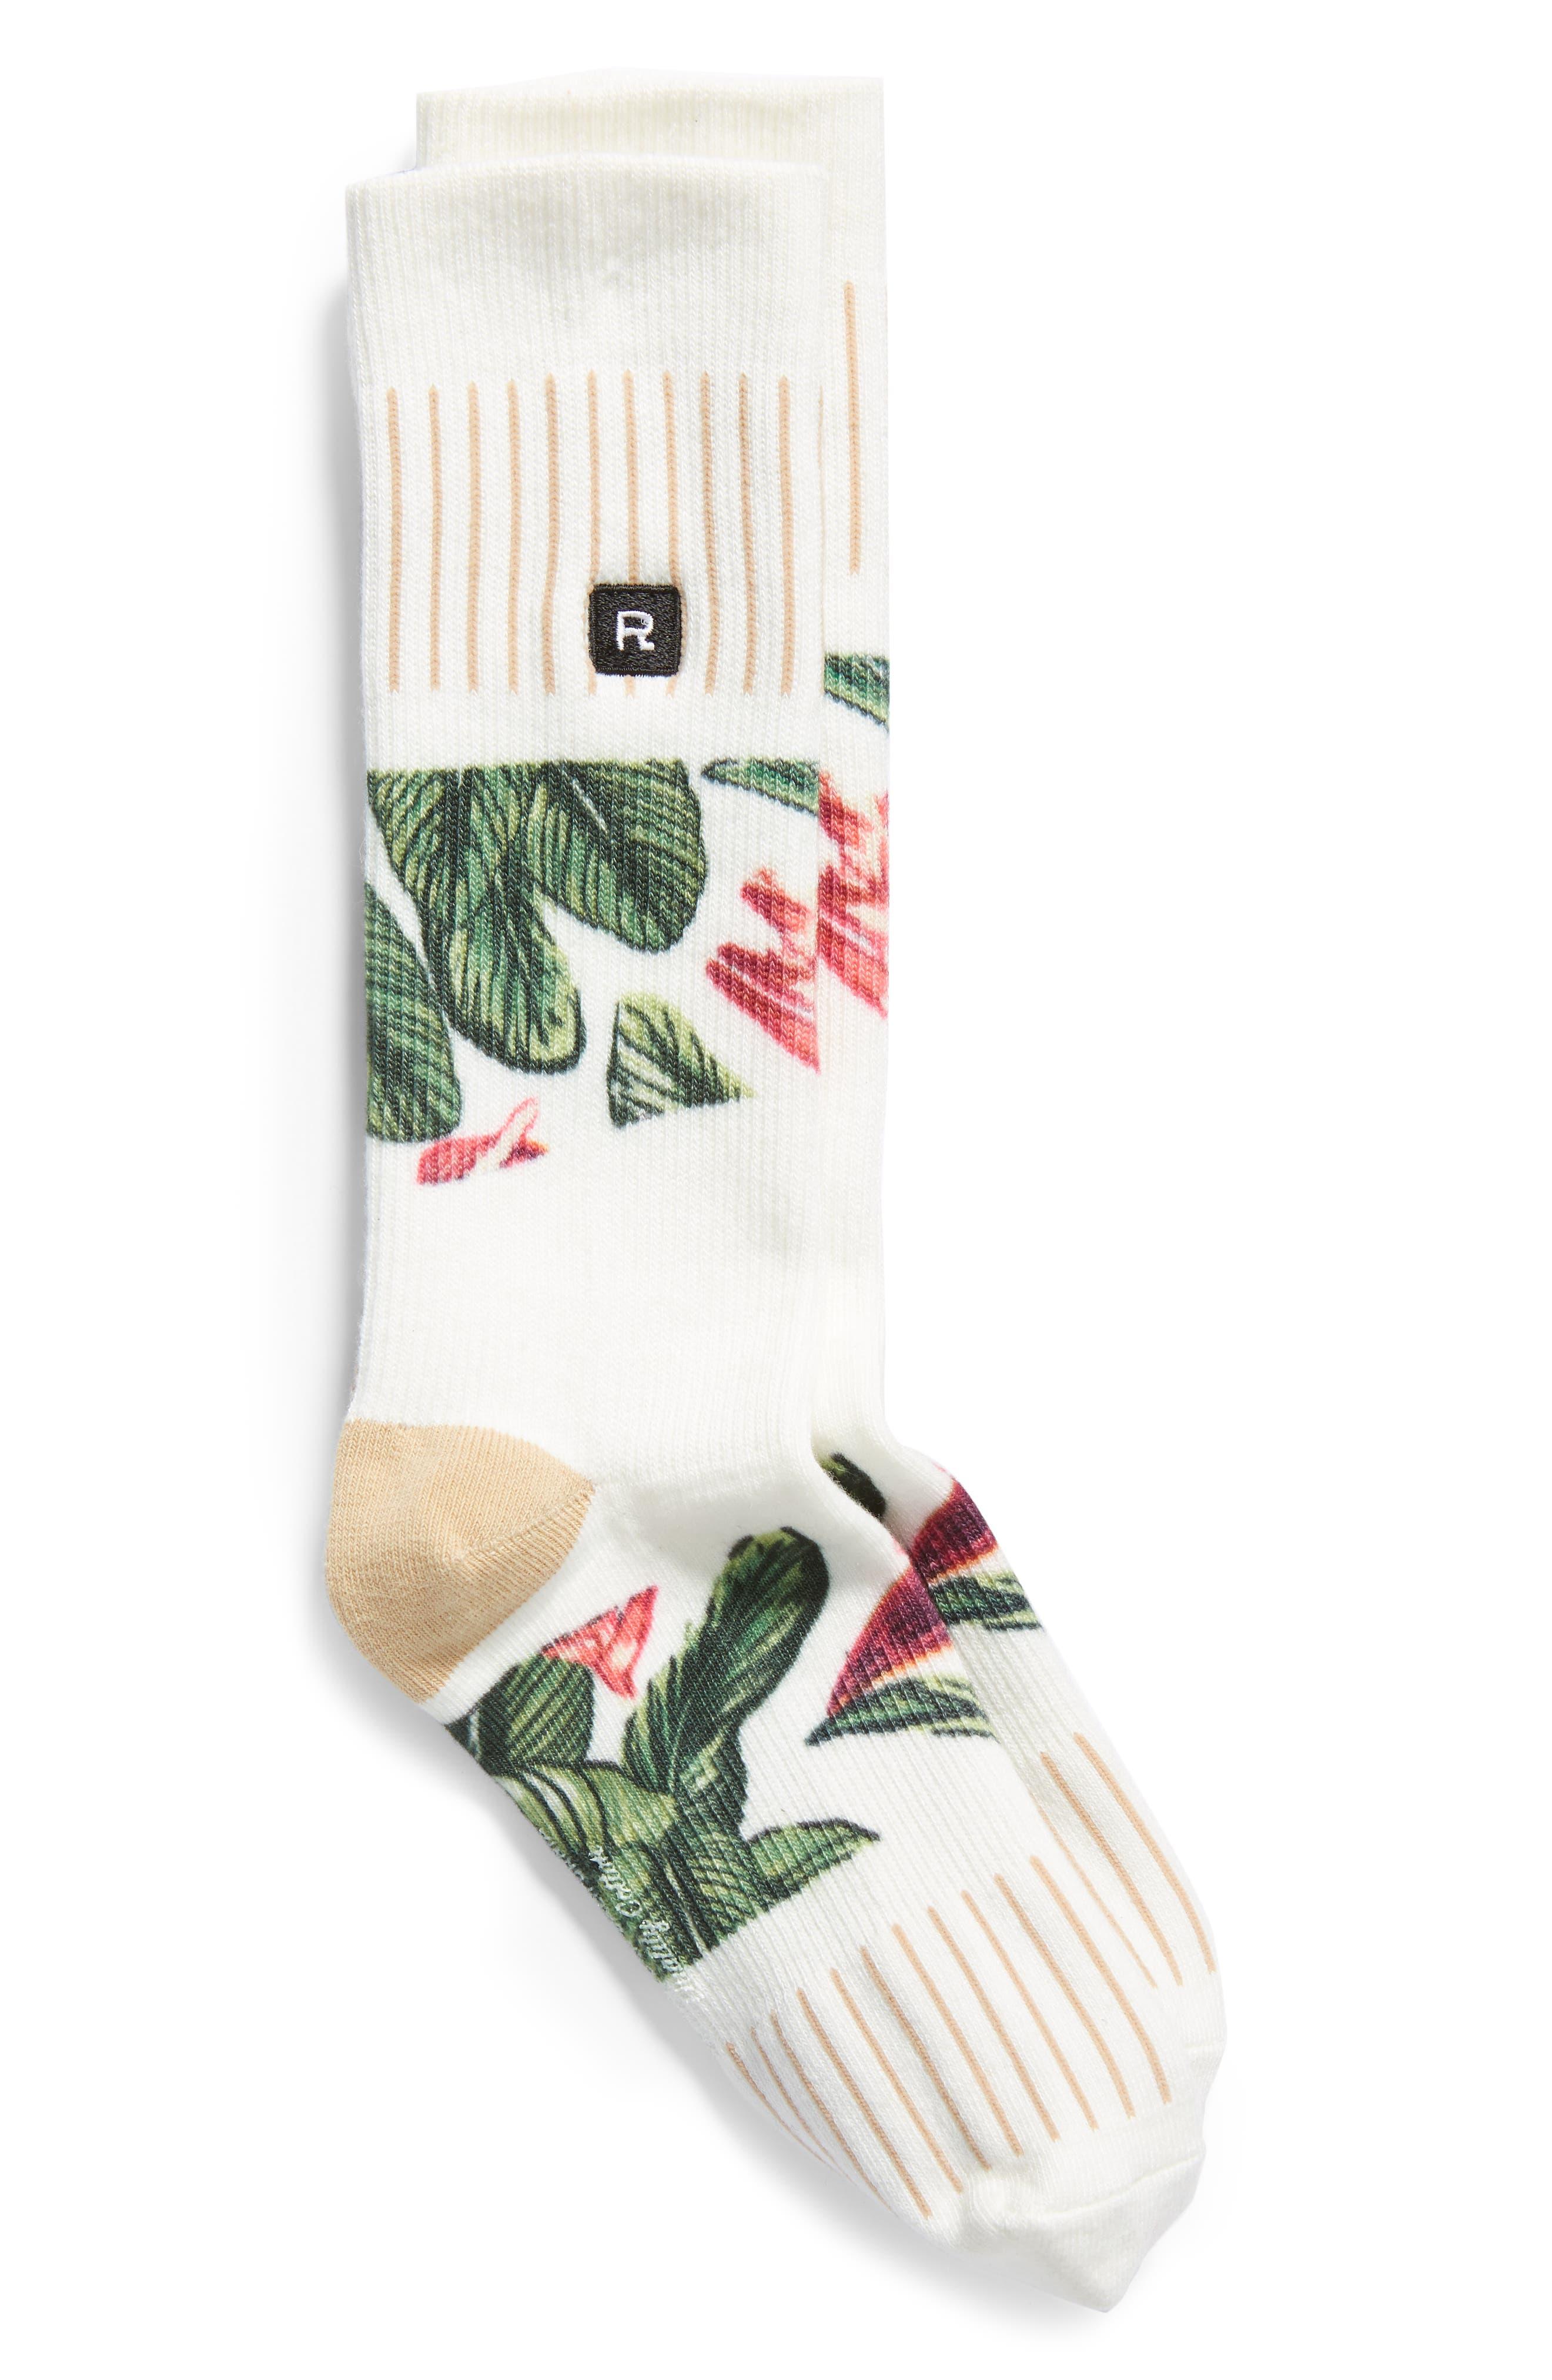 RICHER POORER Malibu Everyday Crew Socks in Ivory